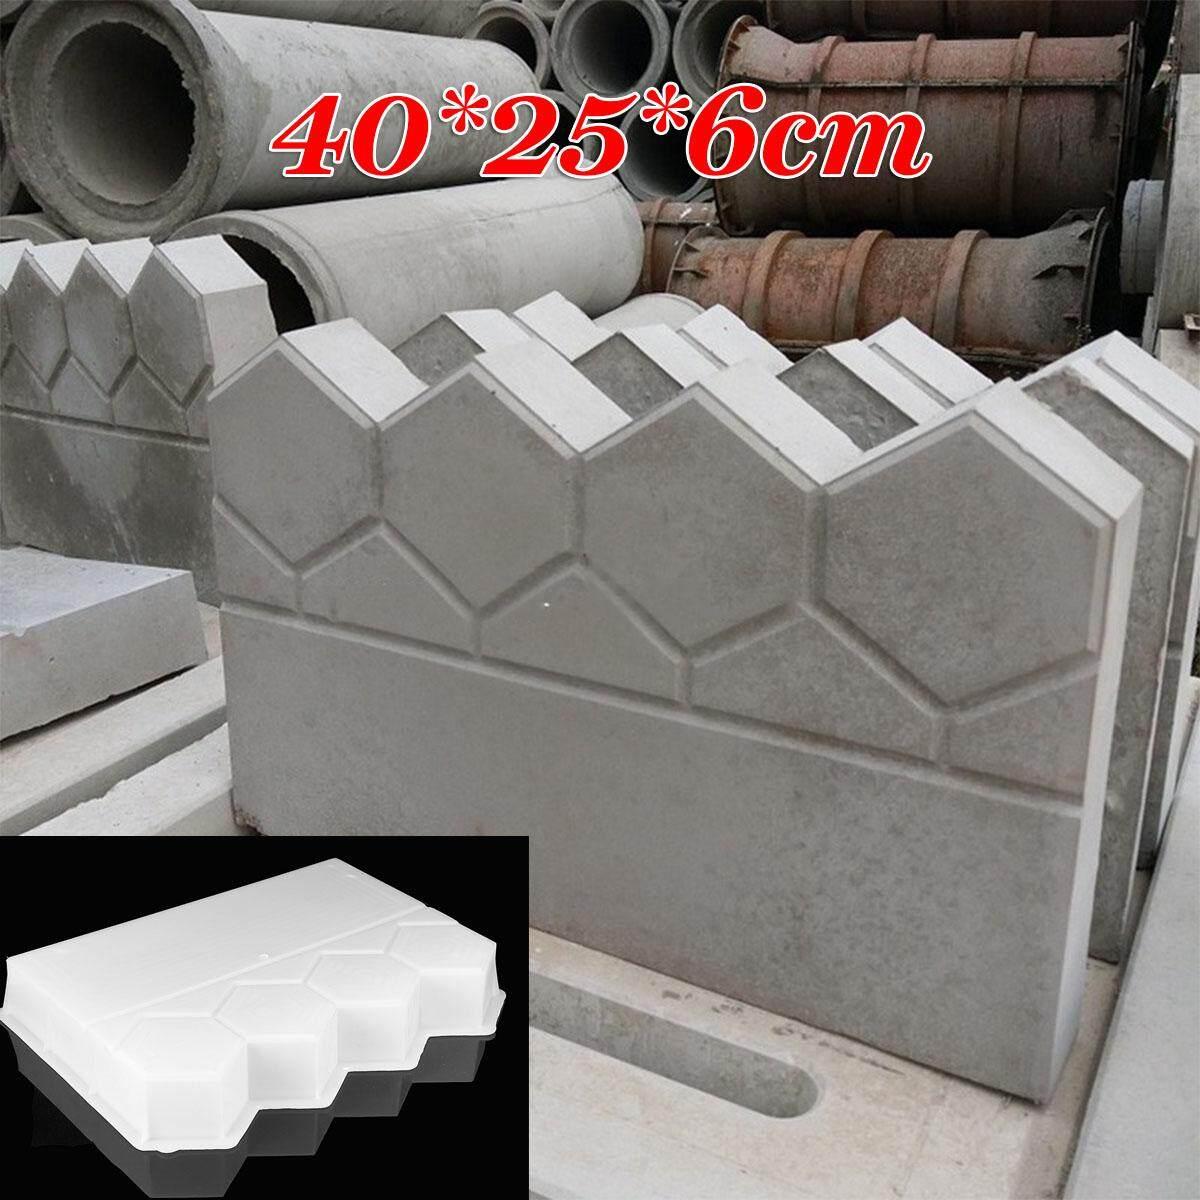 40x25x6cm Antique Garden Brick Cement Mold